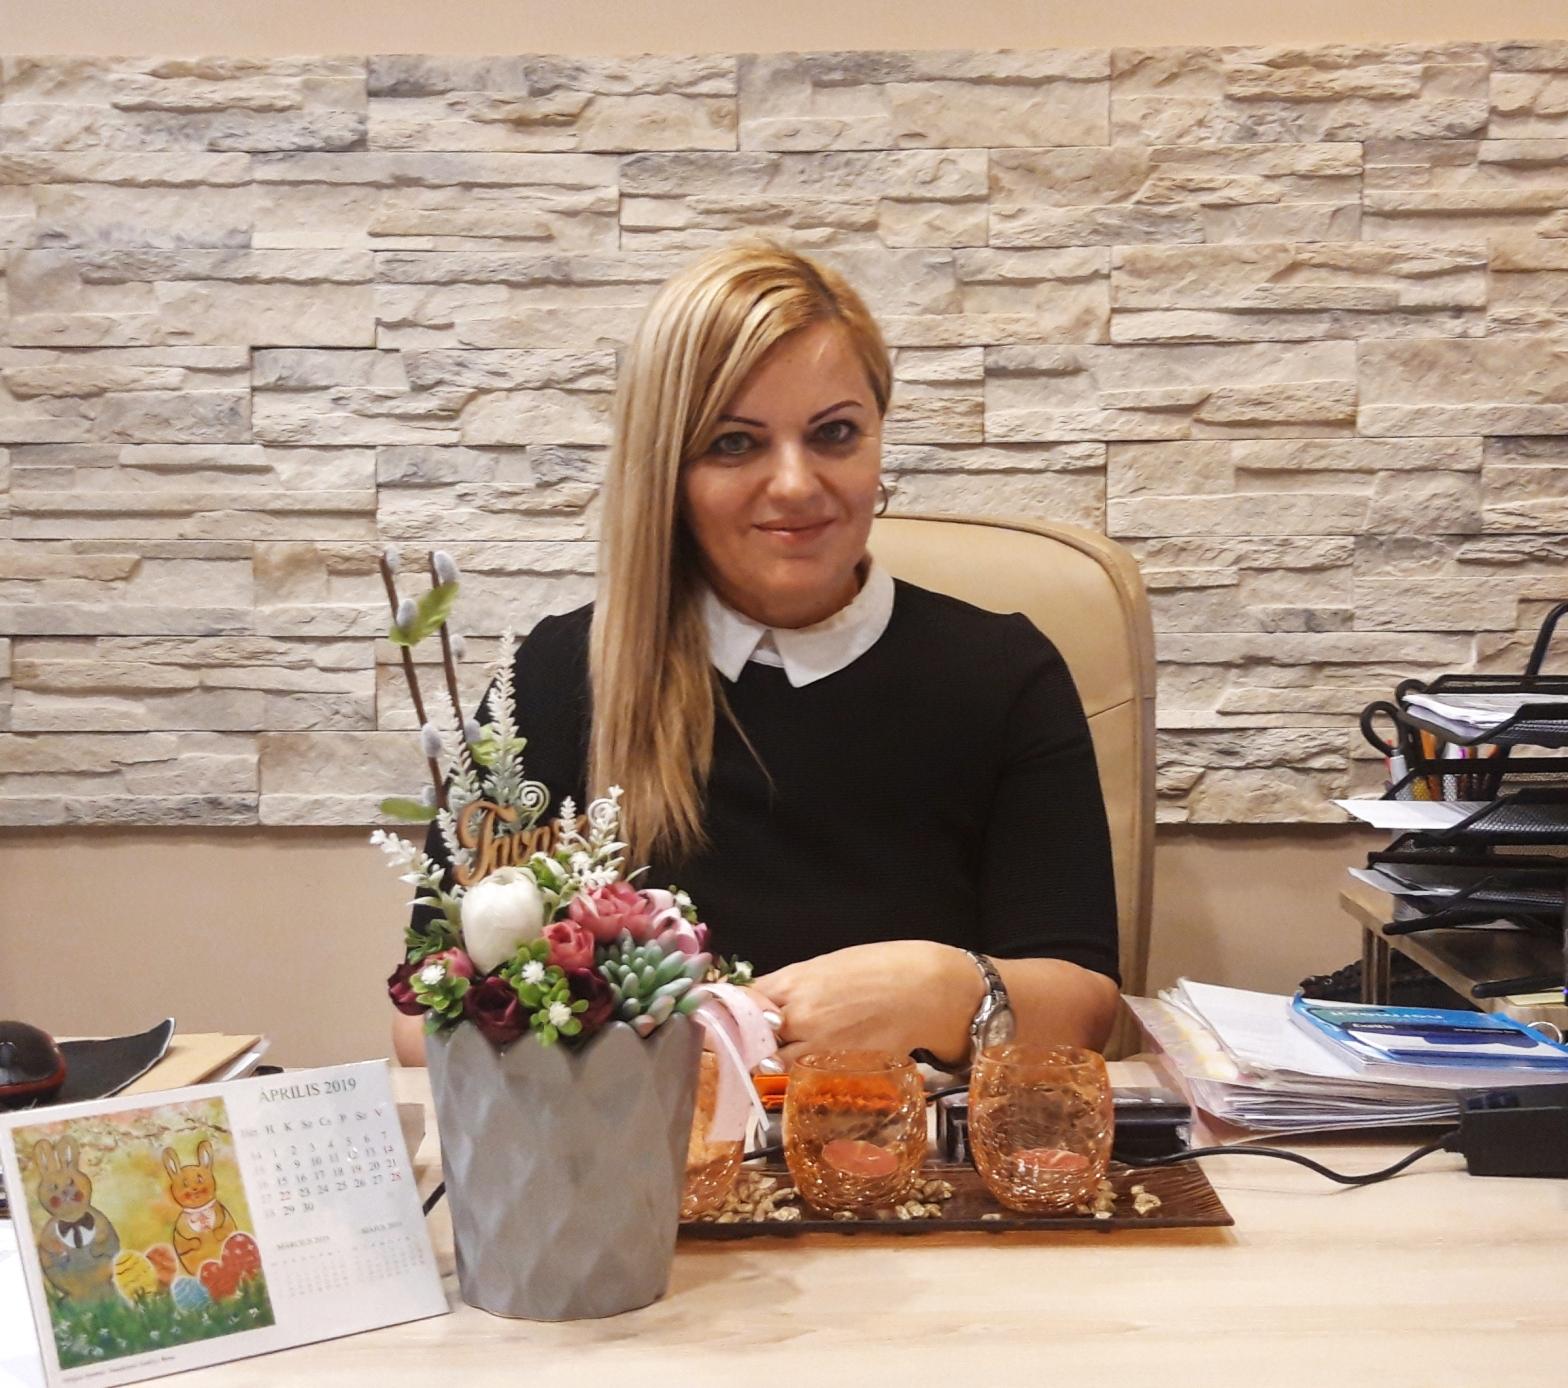 Dr. Popovics Szvetlana - INSUMED tanácsadó orvos